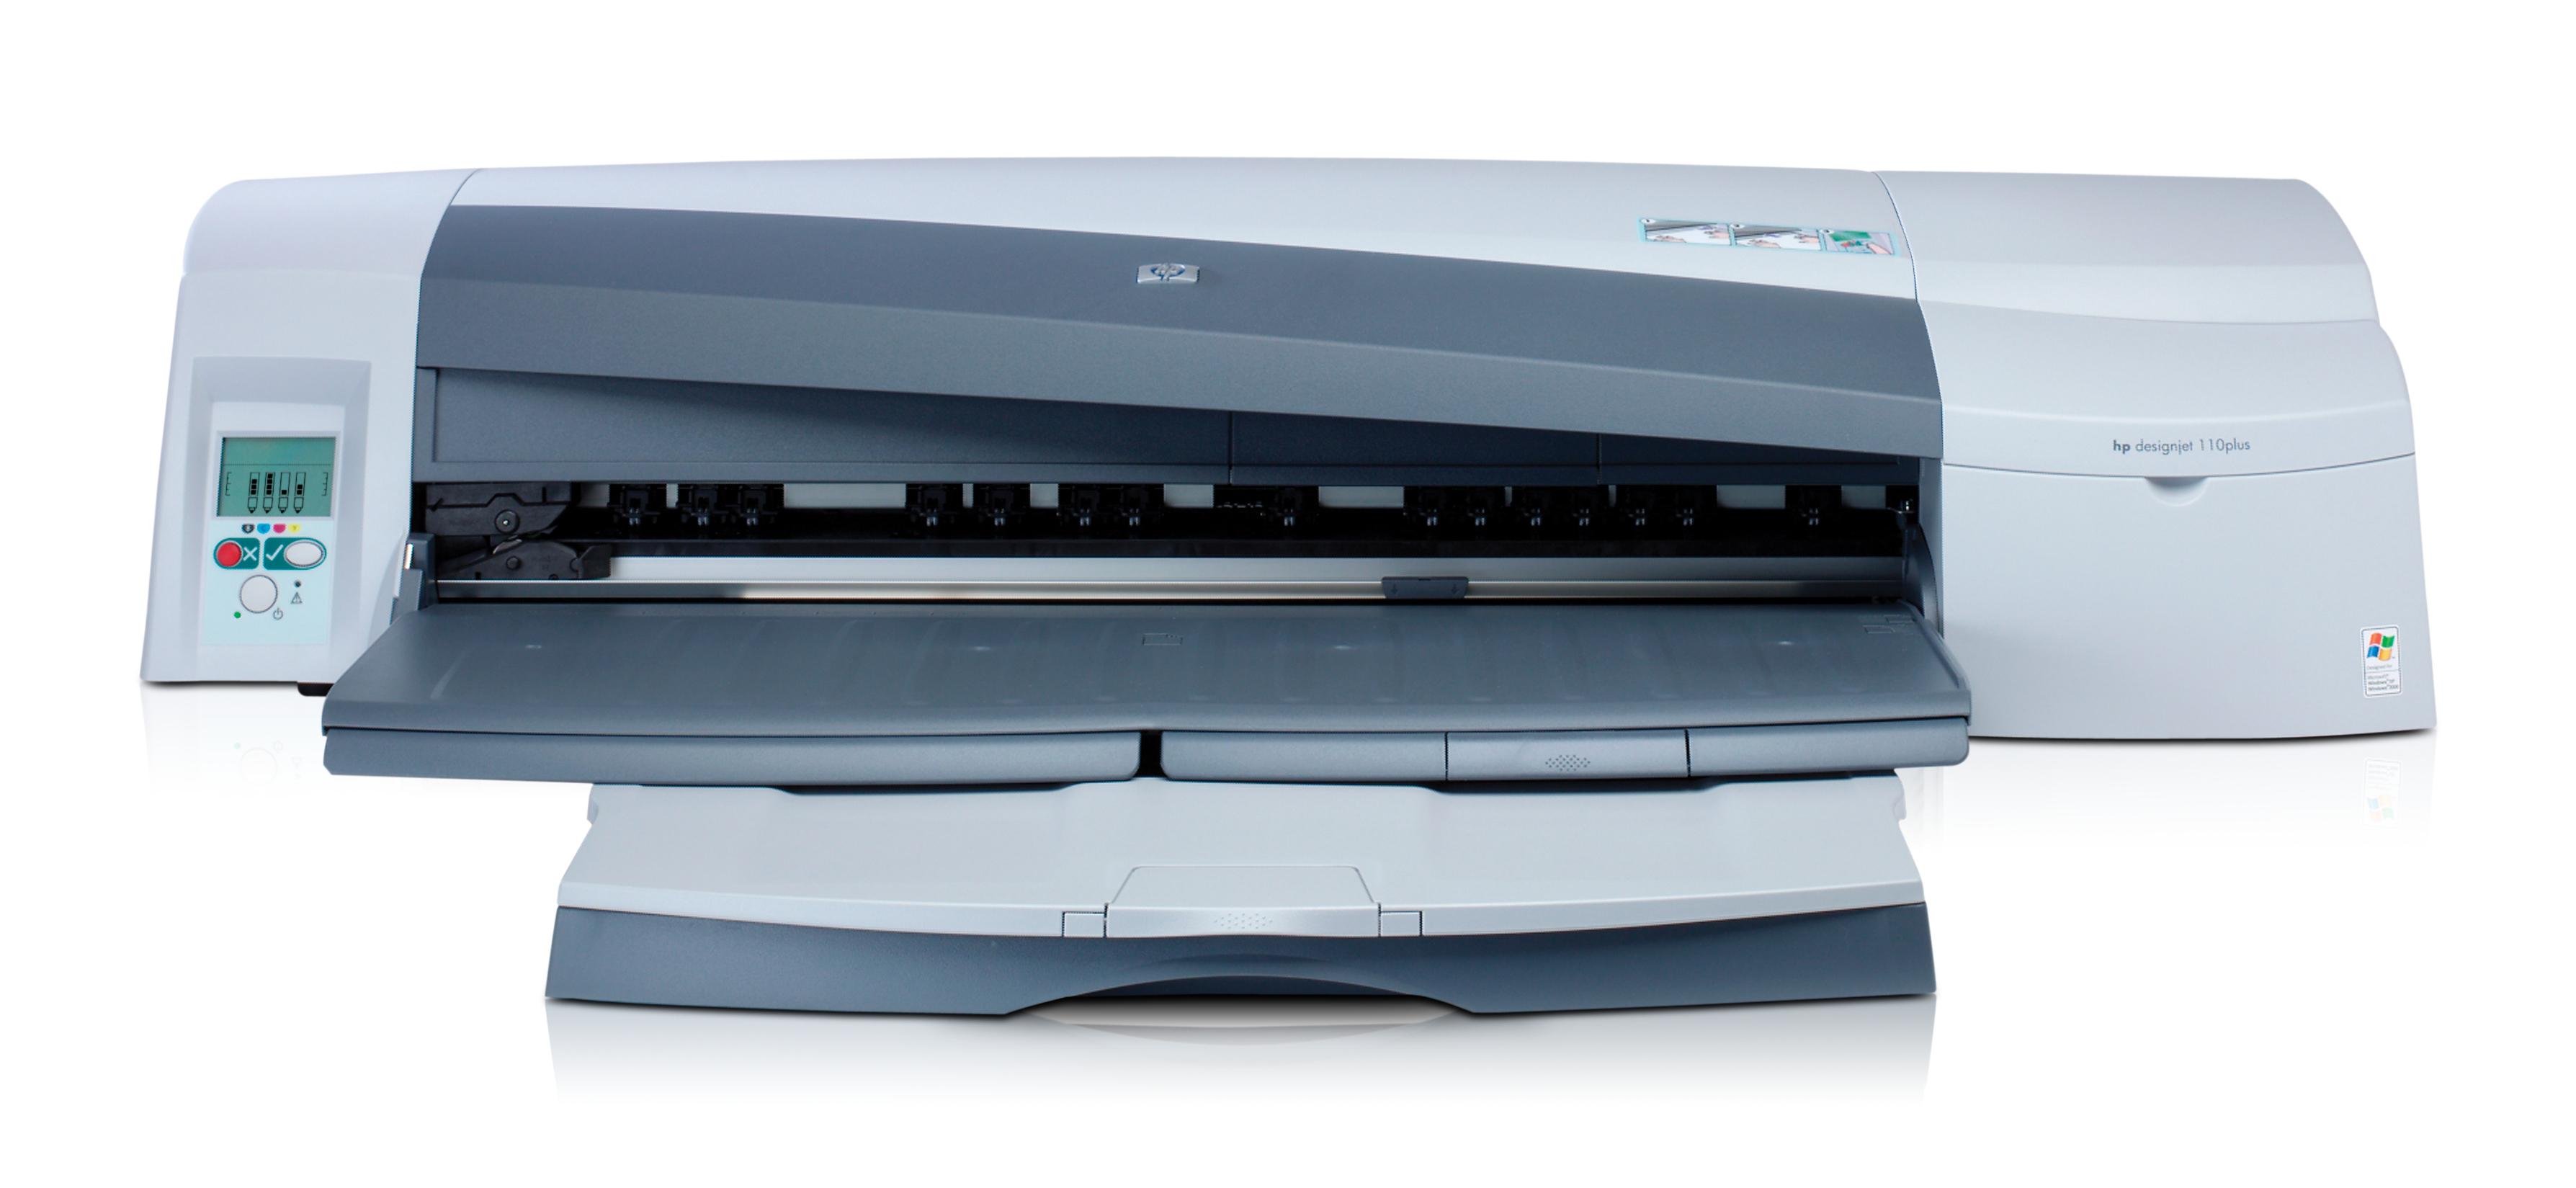 HP Designjet 110plus nr Printer C7796E - Refurbished